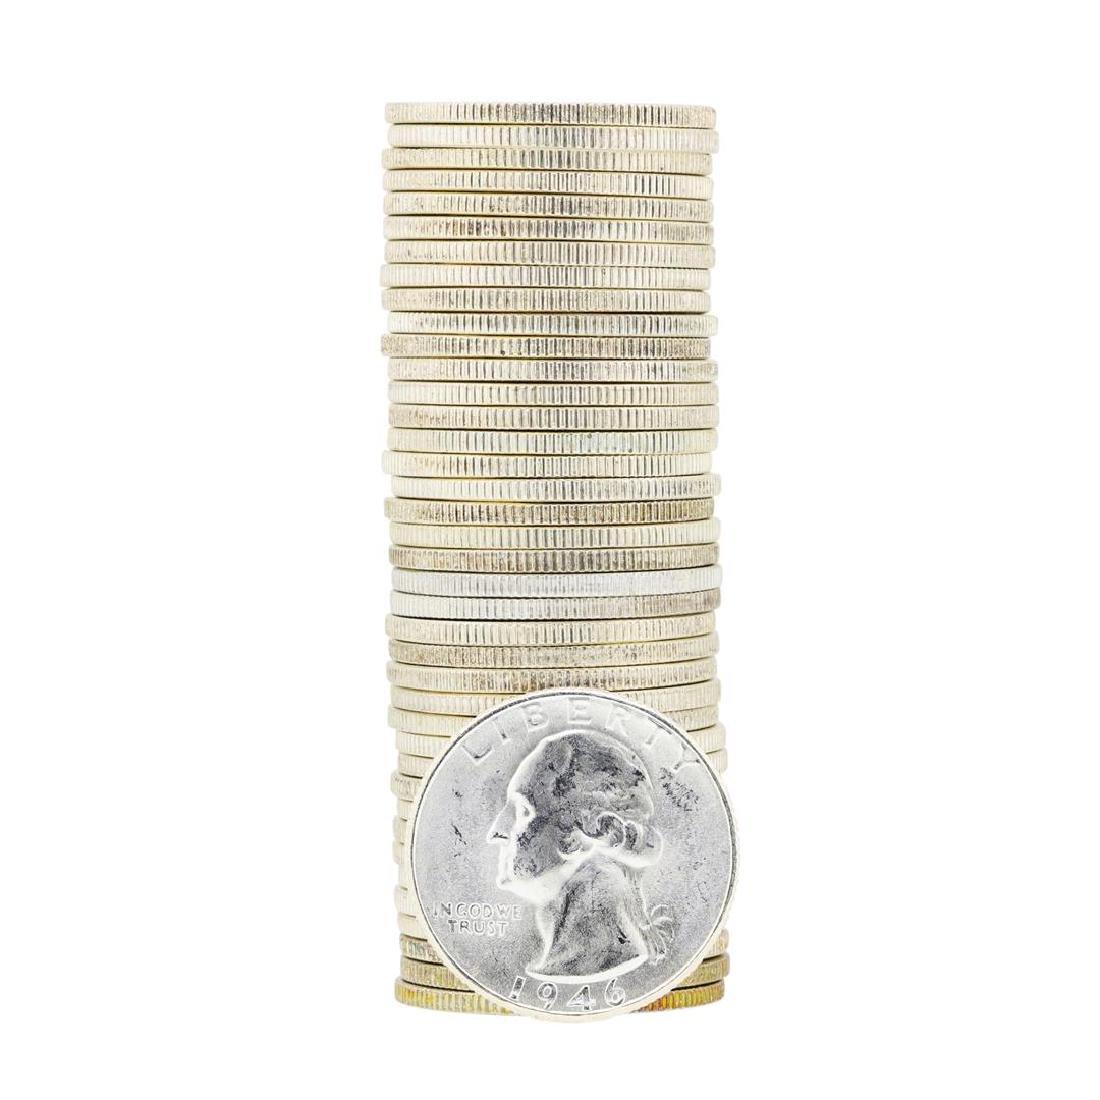 Tube of 40 1946S Washington Quarter Dollars